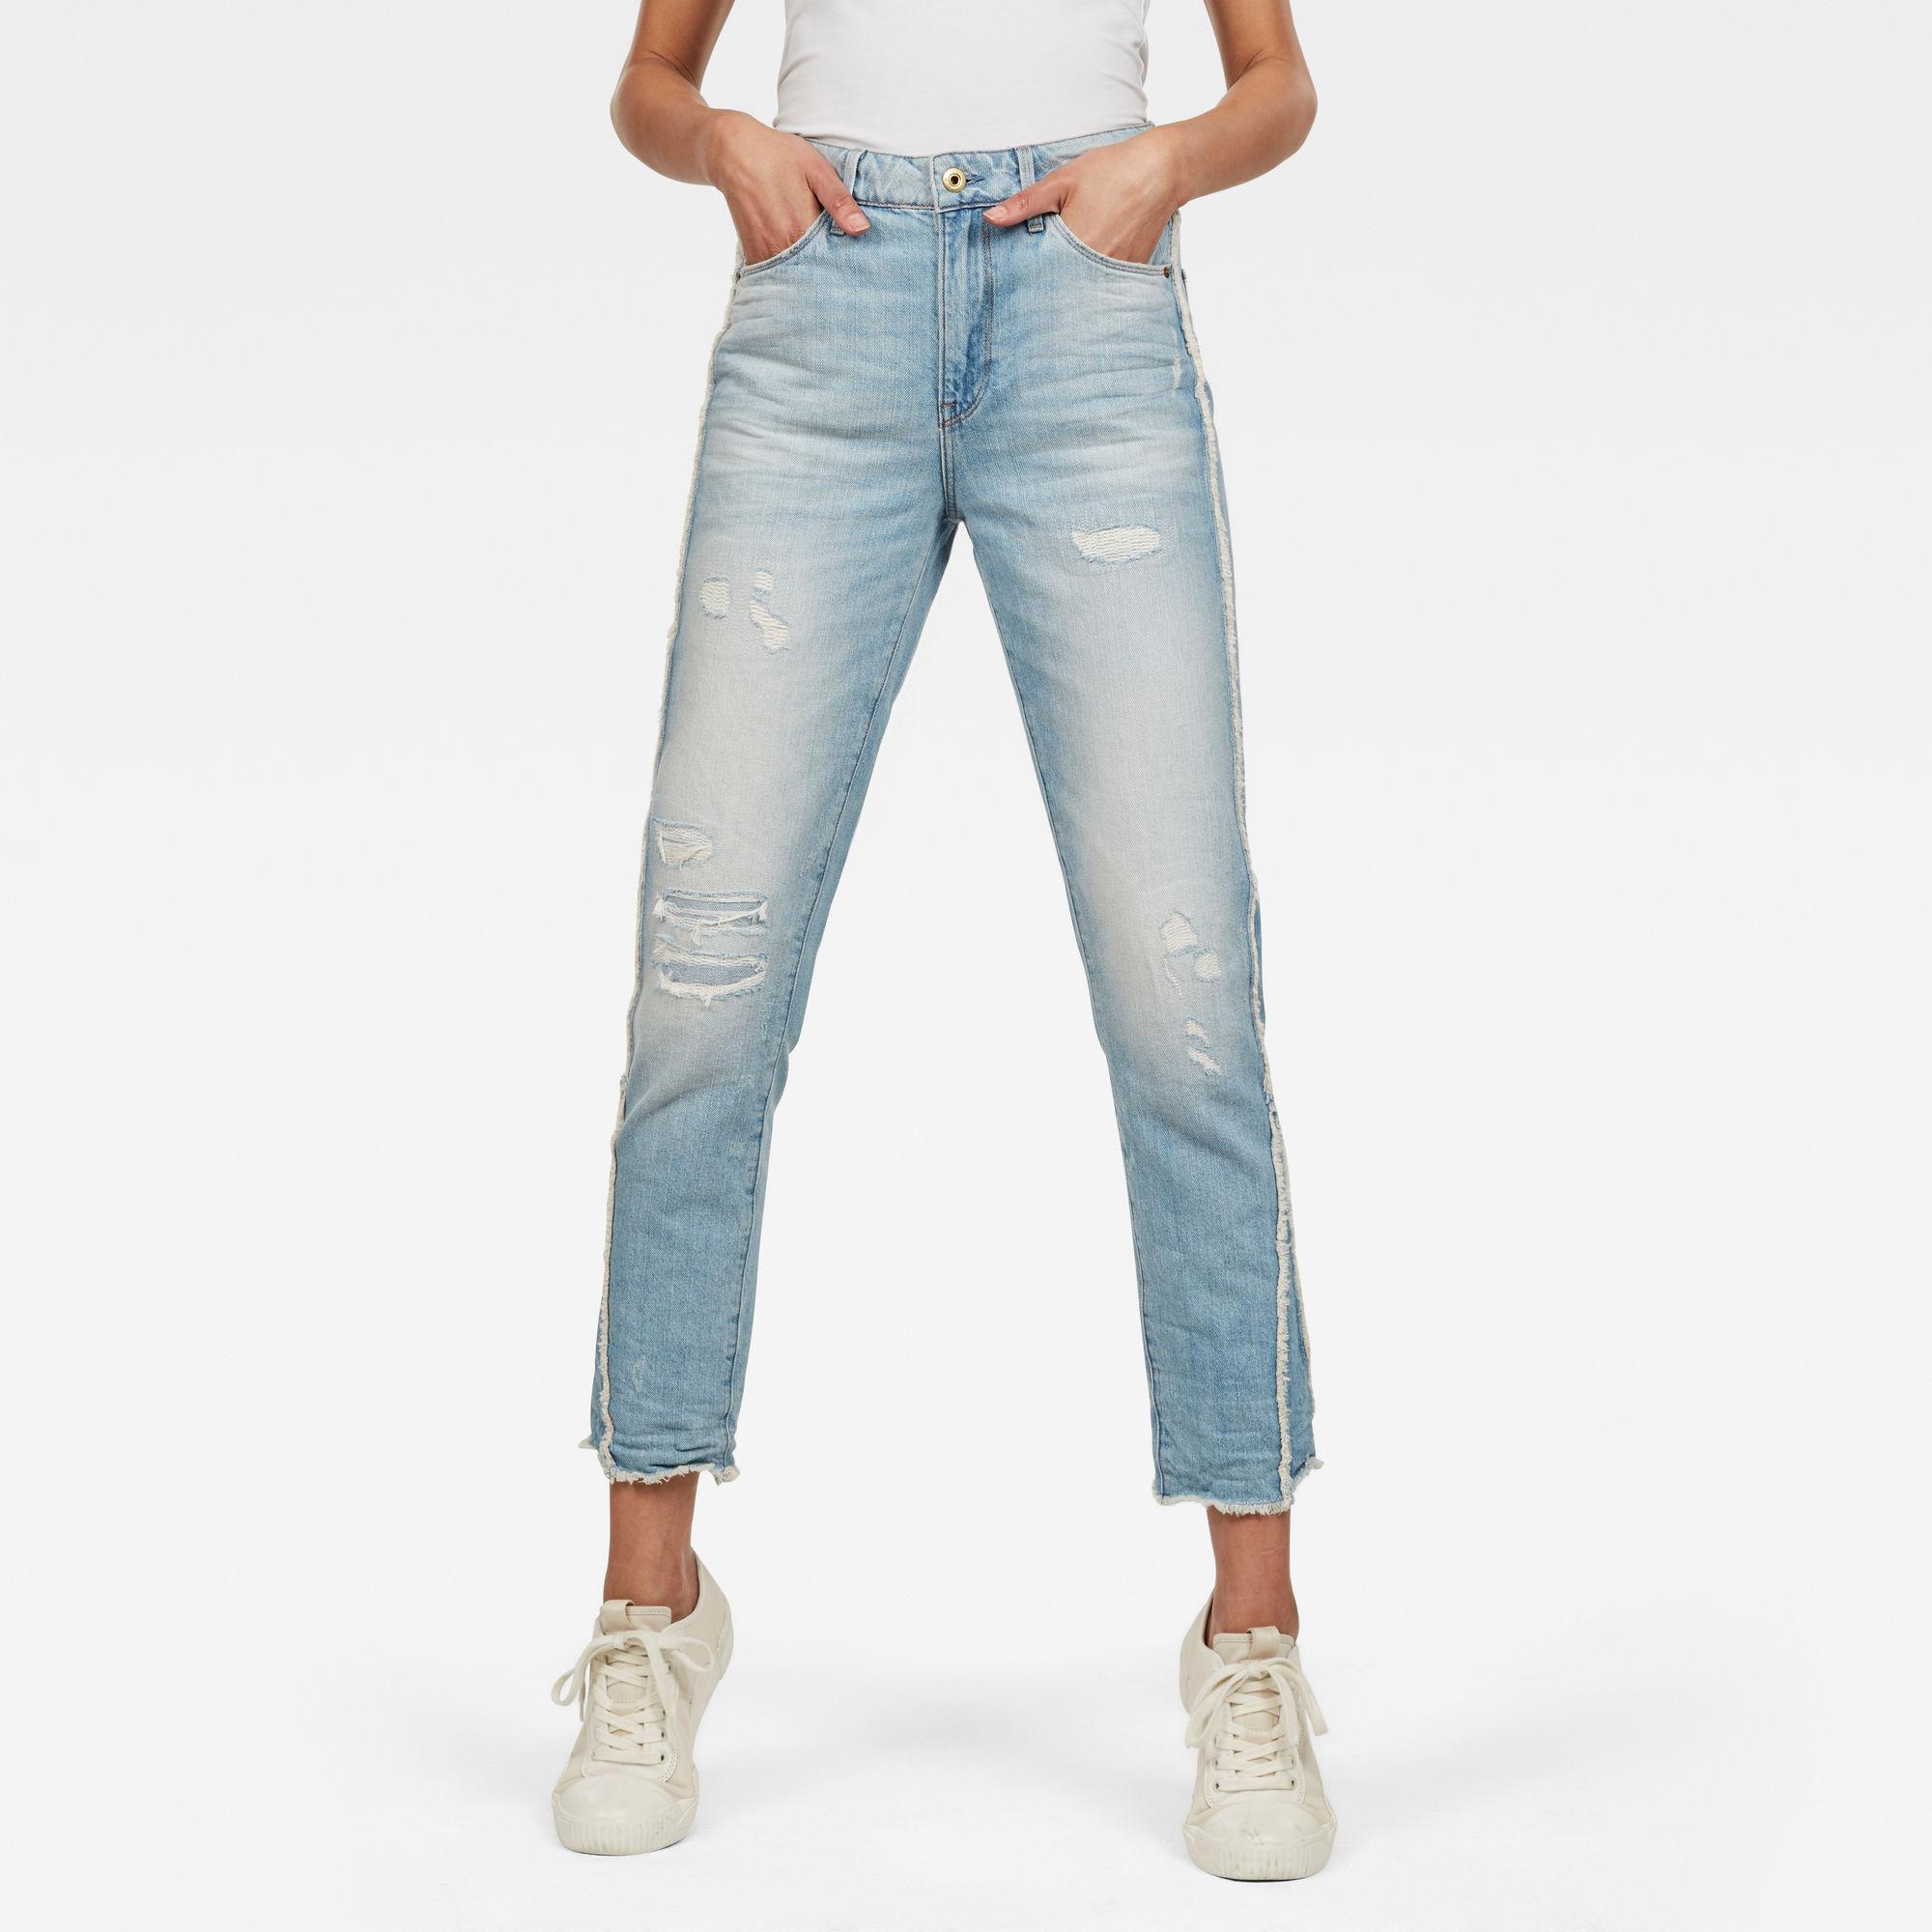 Van G Star Raw 3301 Fringe RP High Straight Ankle Jeans Prijsvergelijk nu!